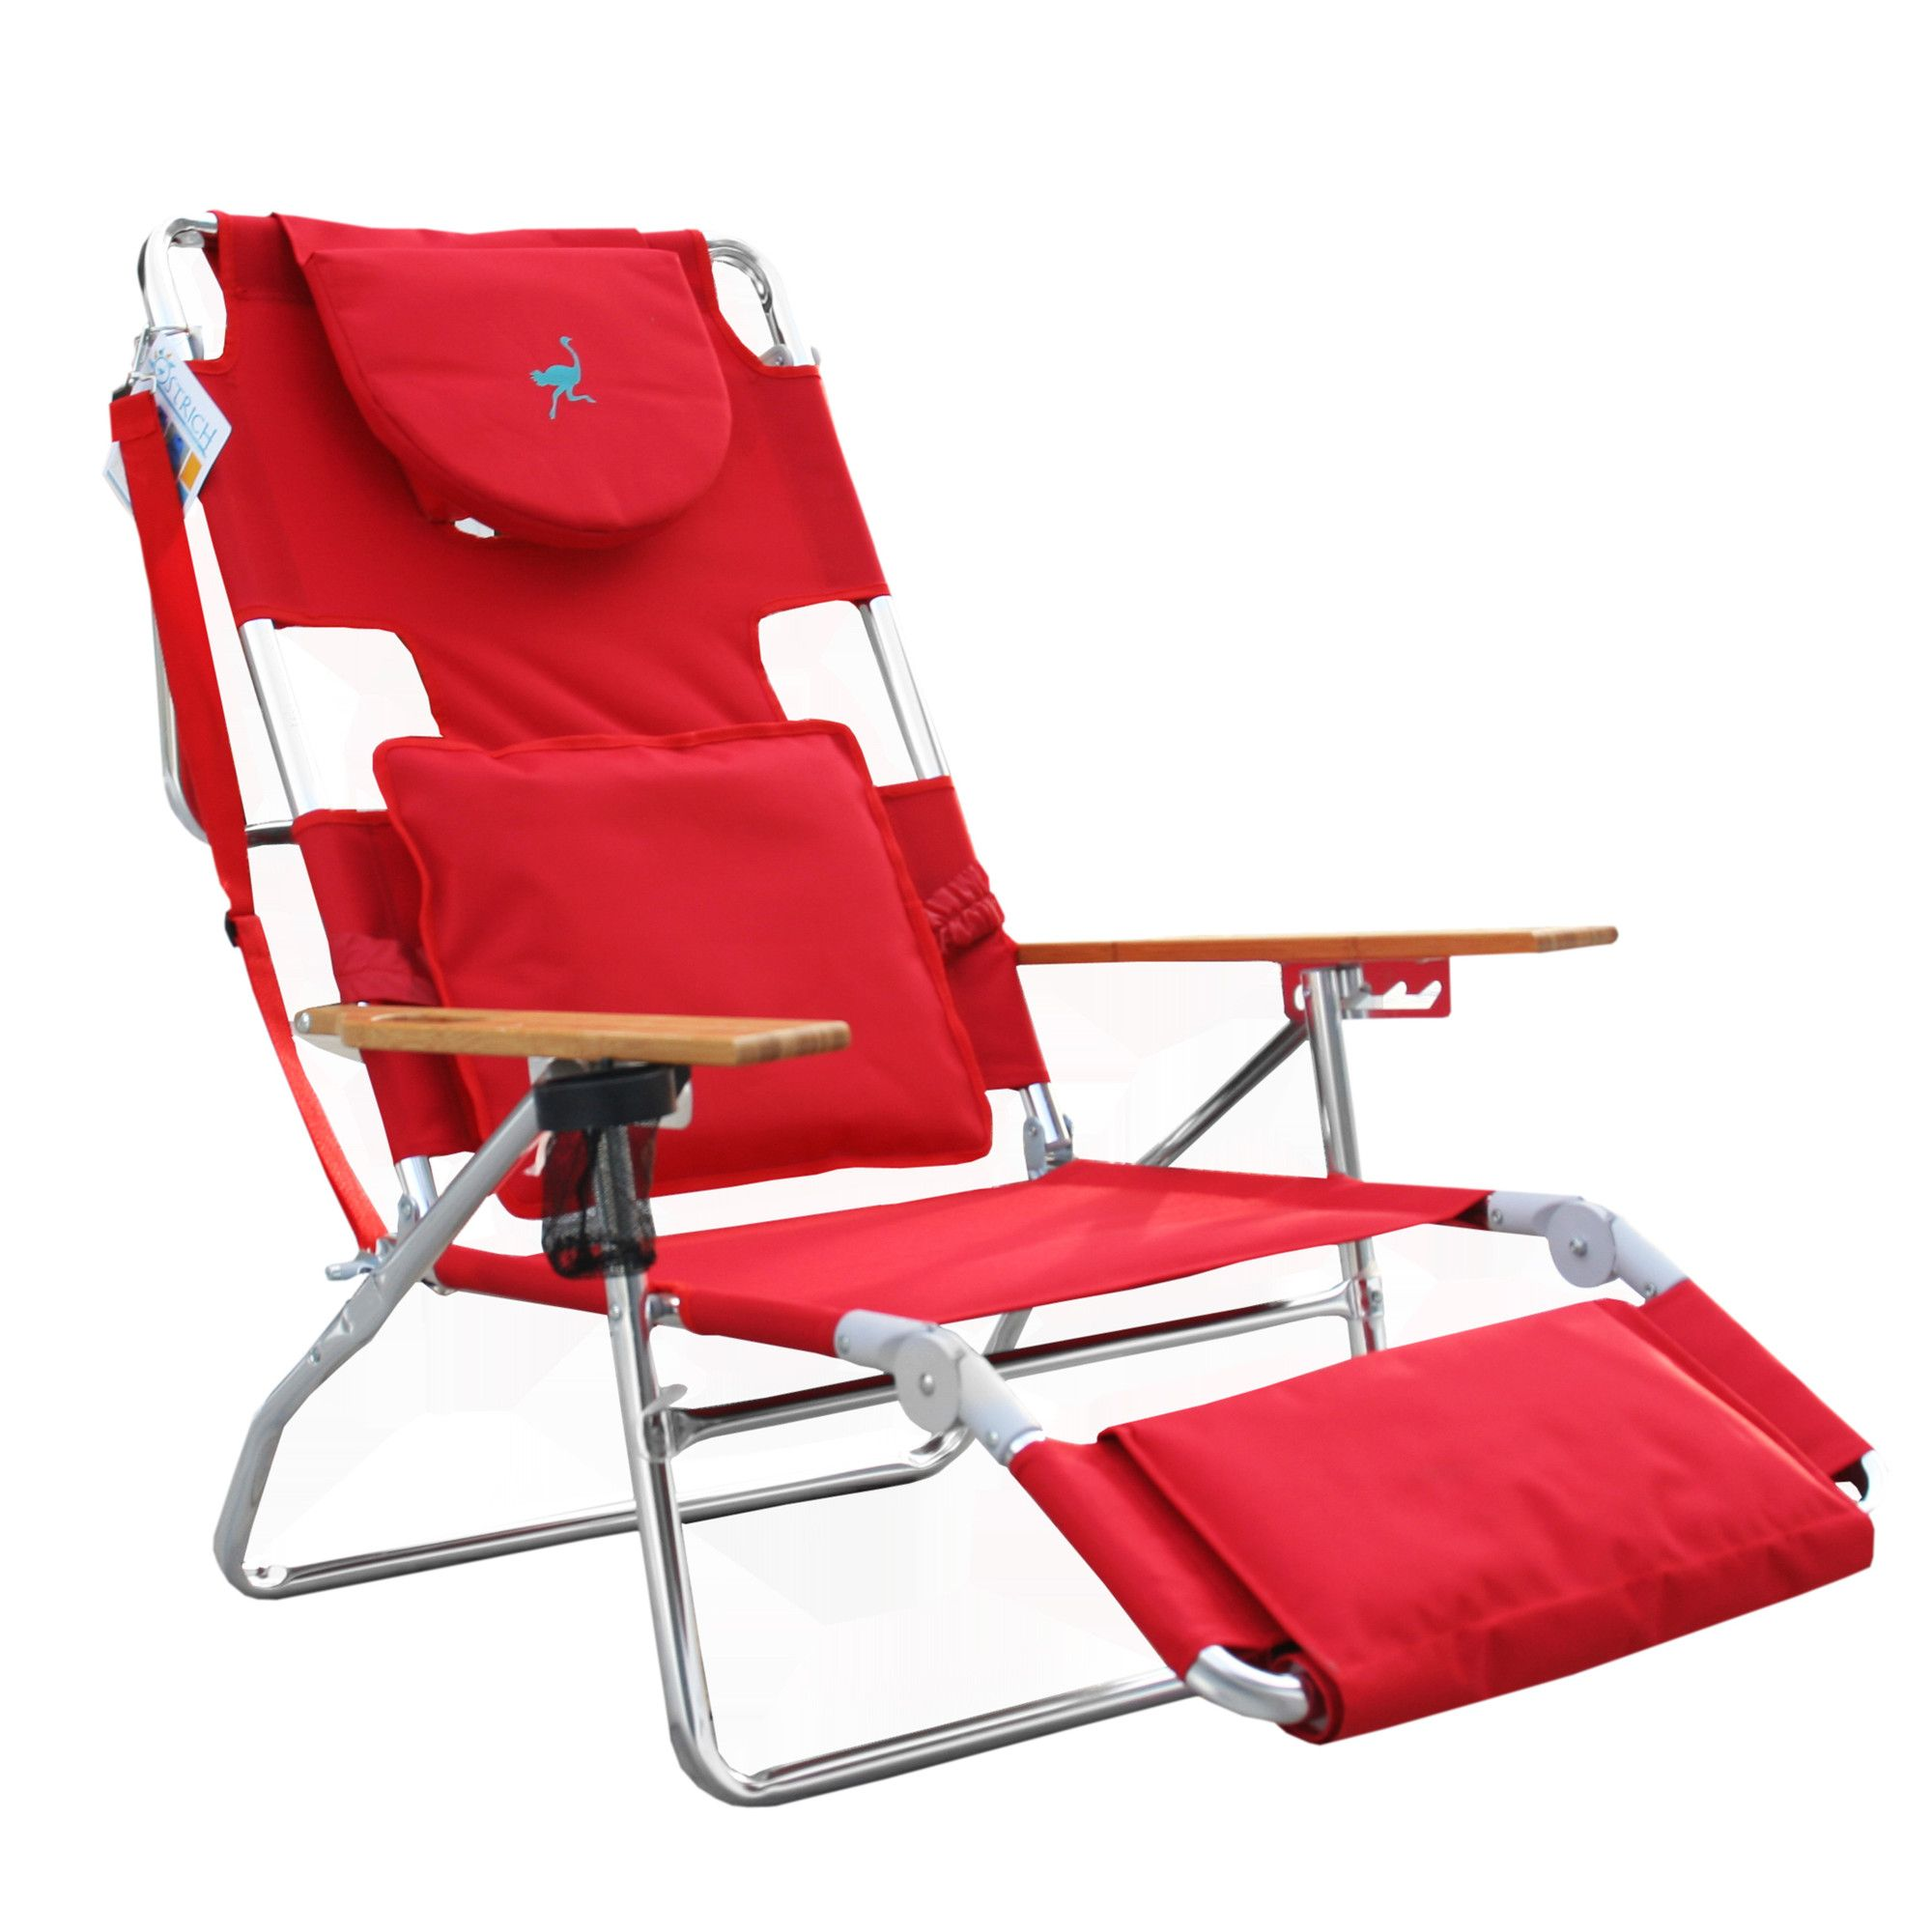 Tamira beach chair products pinterest beach chairs chair and